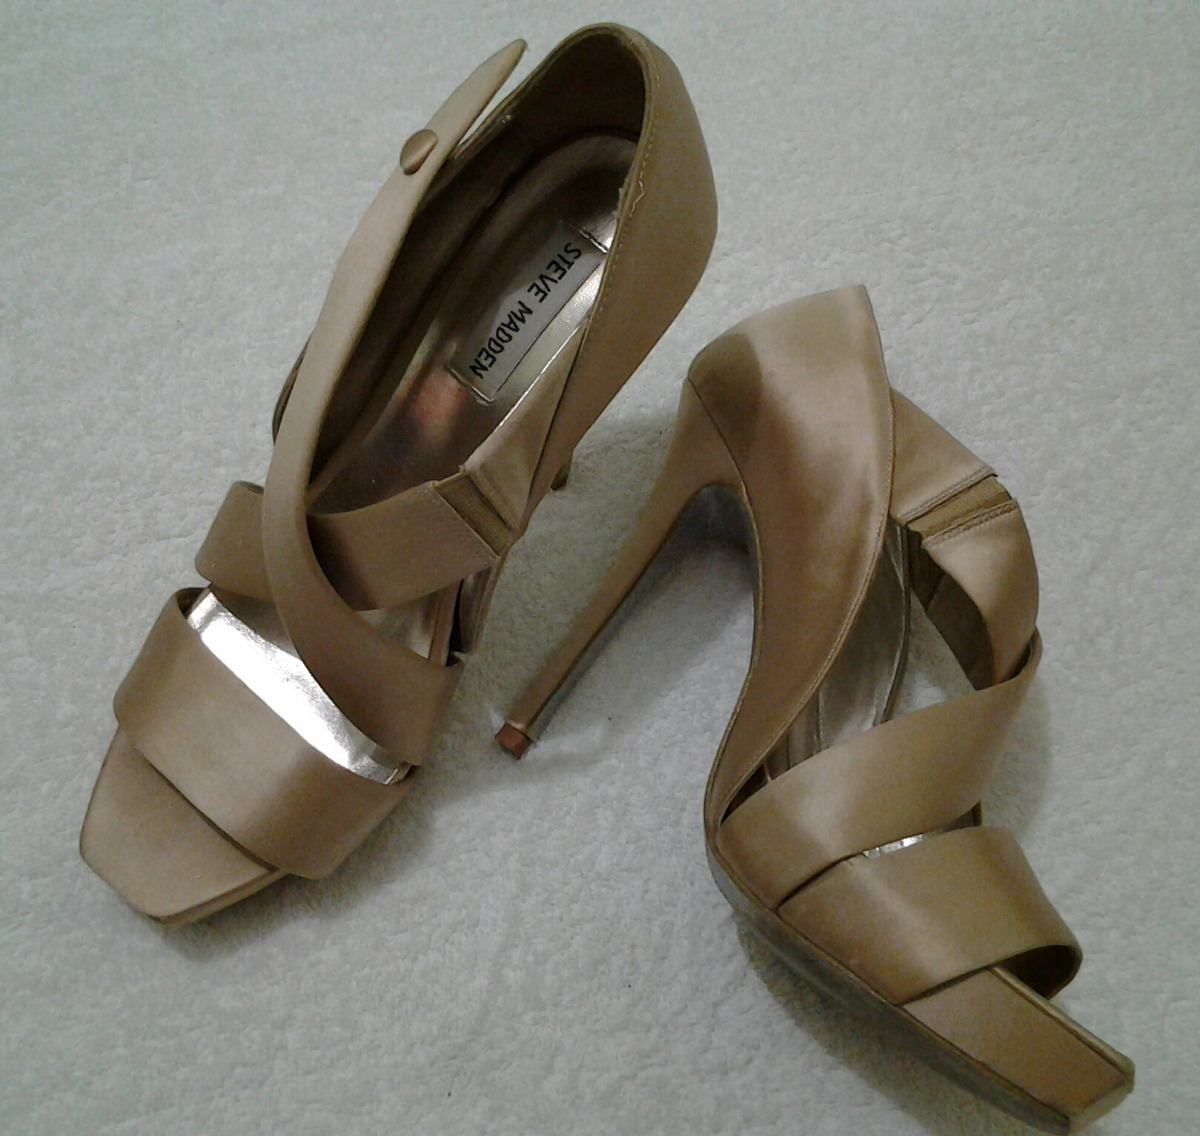 Bigote espiral No autorizado  Zapatos Steve Madden Originales - Bs. 6.500.000,00 en Mercado Libre